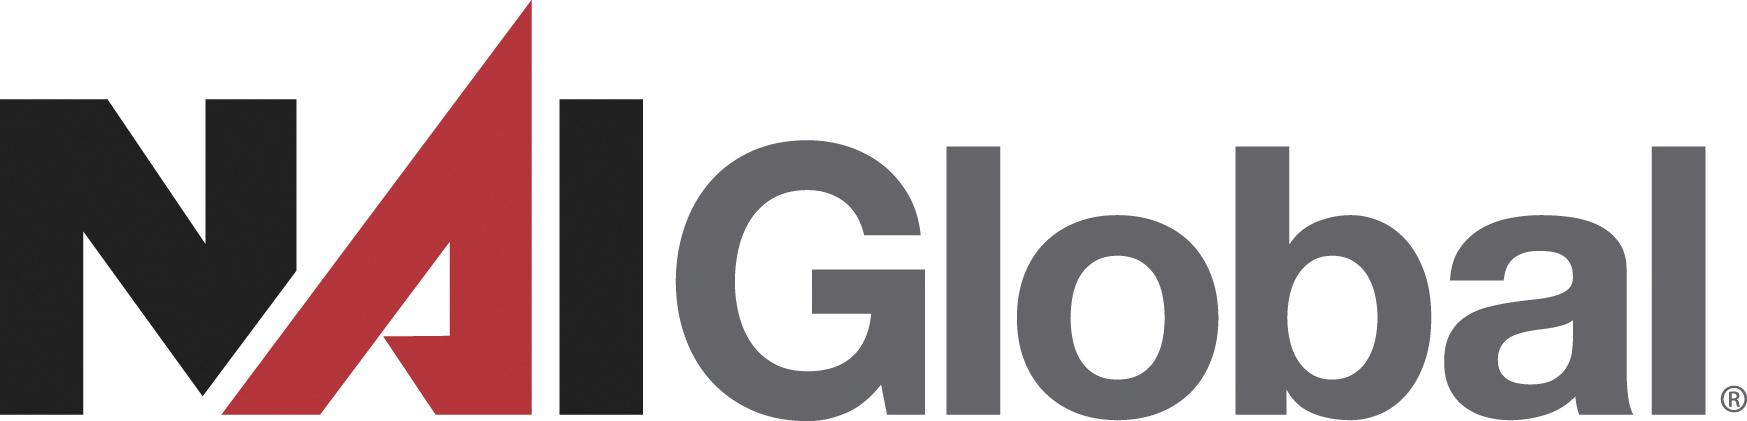 NAI Global 2021 C5 Summit logo July 12, 2021